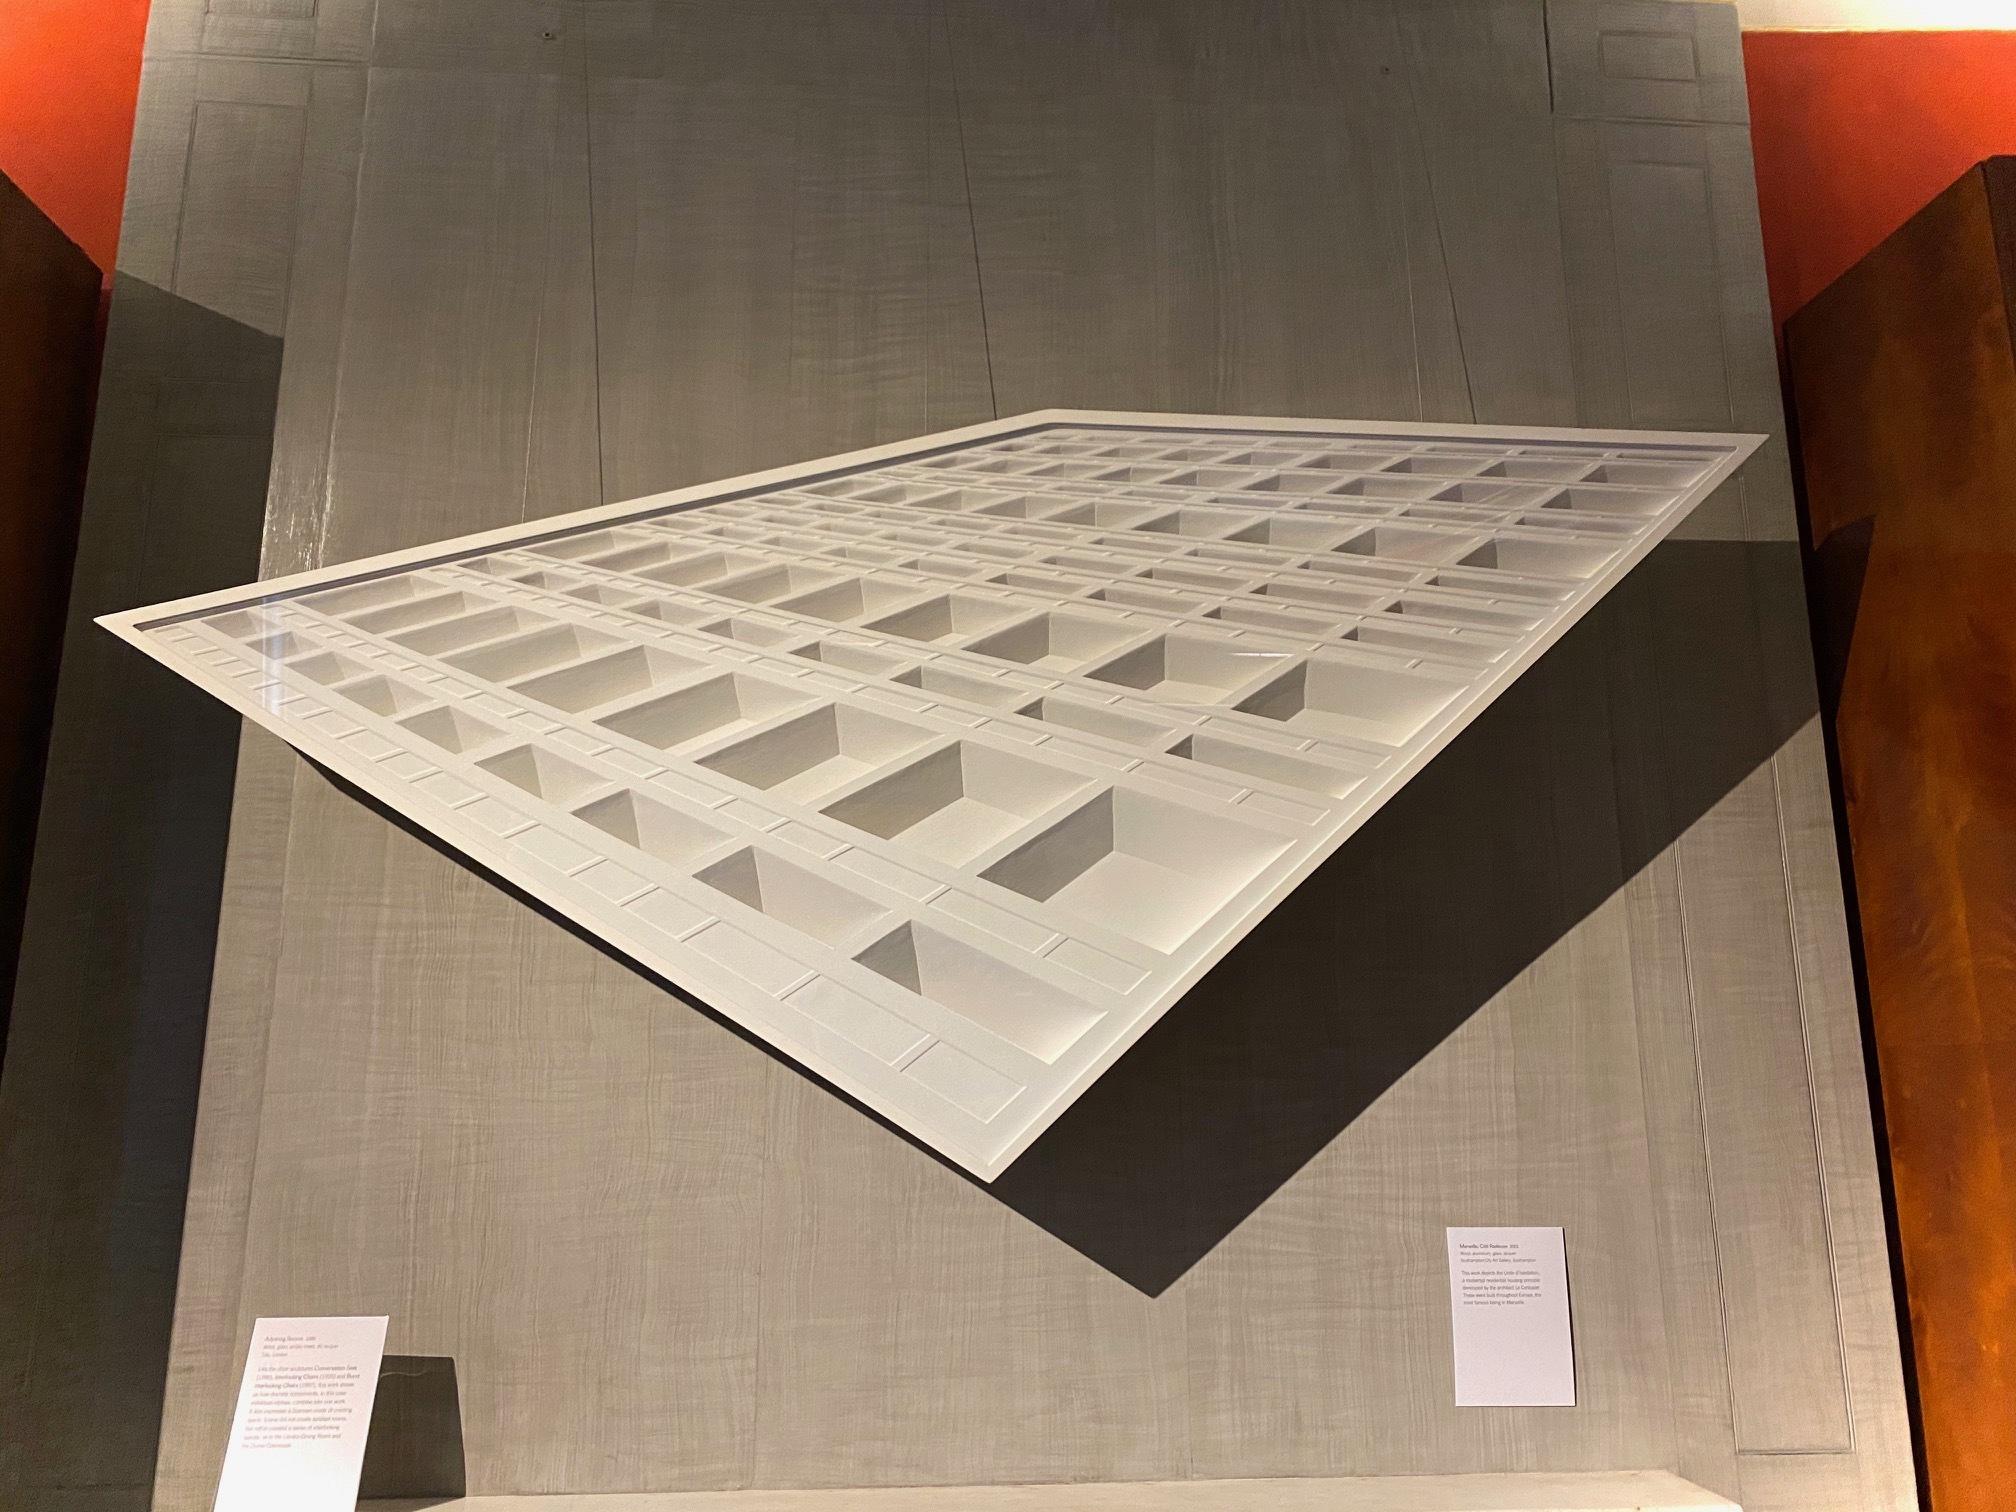 Langlands & Bell, 'Marseille, Cité Radieuse' (2001), installation view. Sir John Soane's Museum